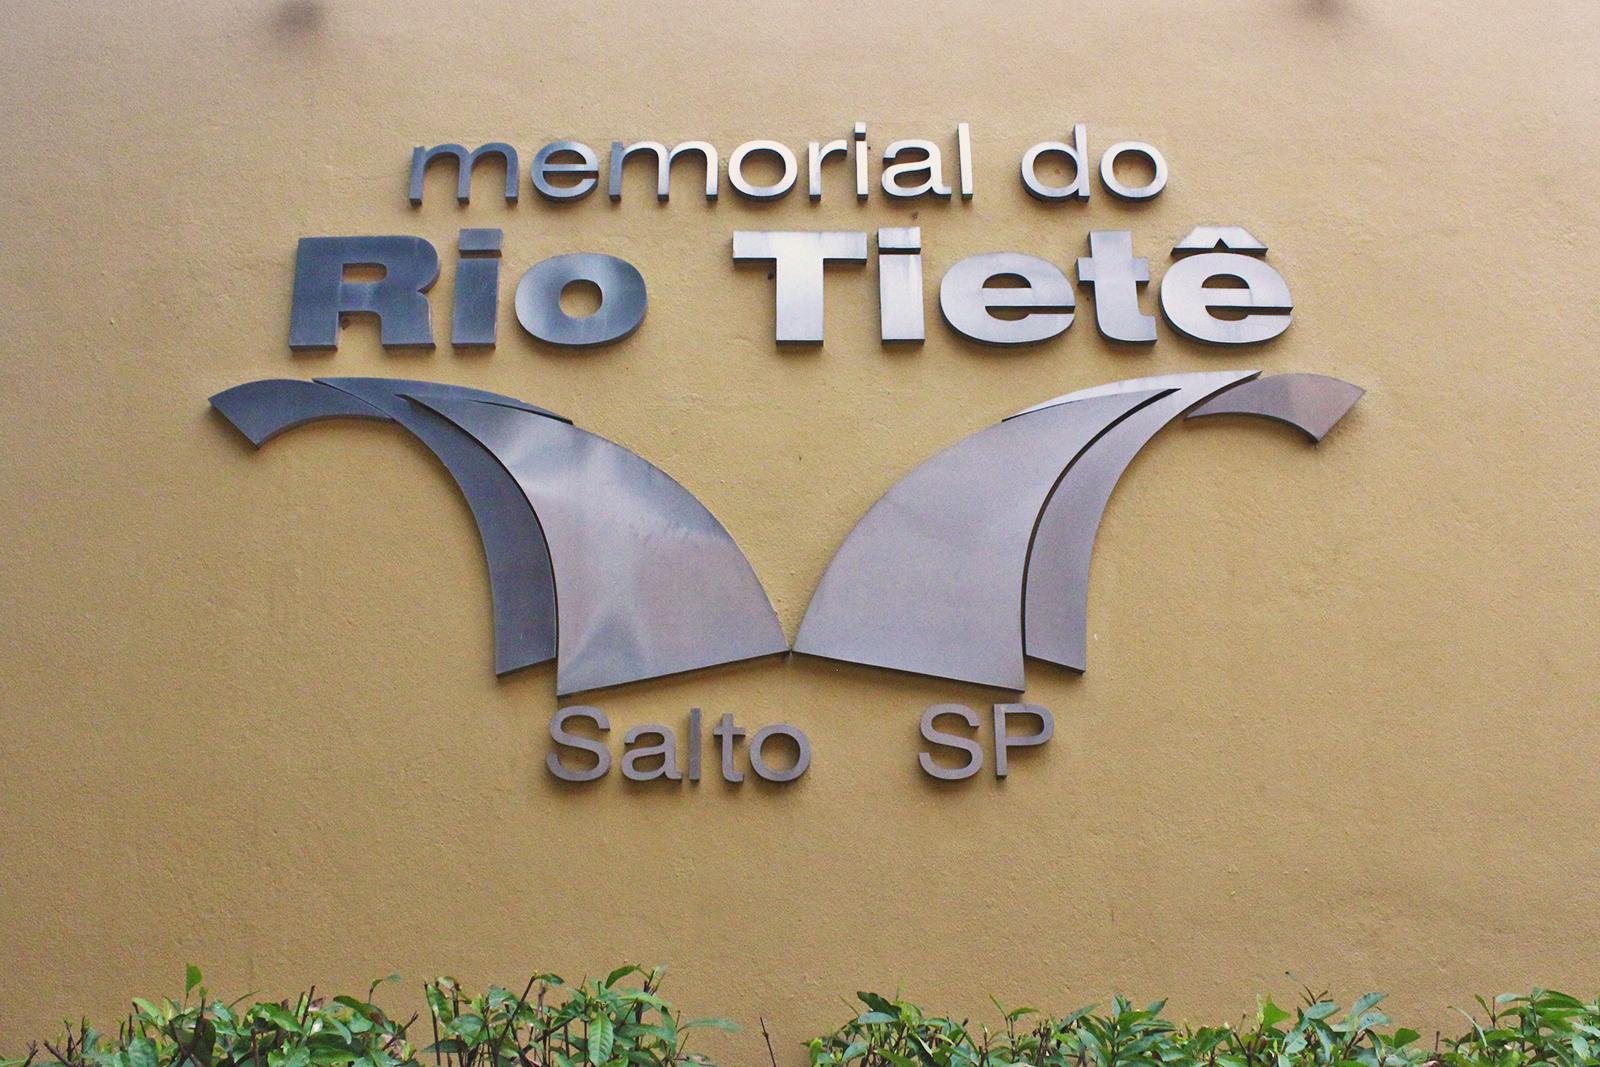 memorial rio tiete salto